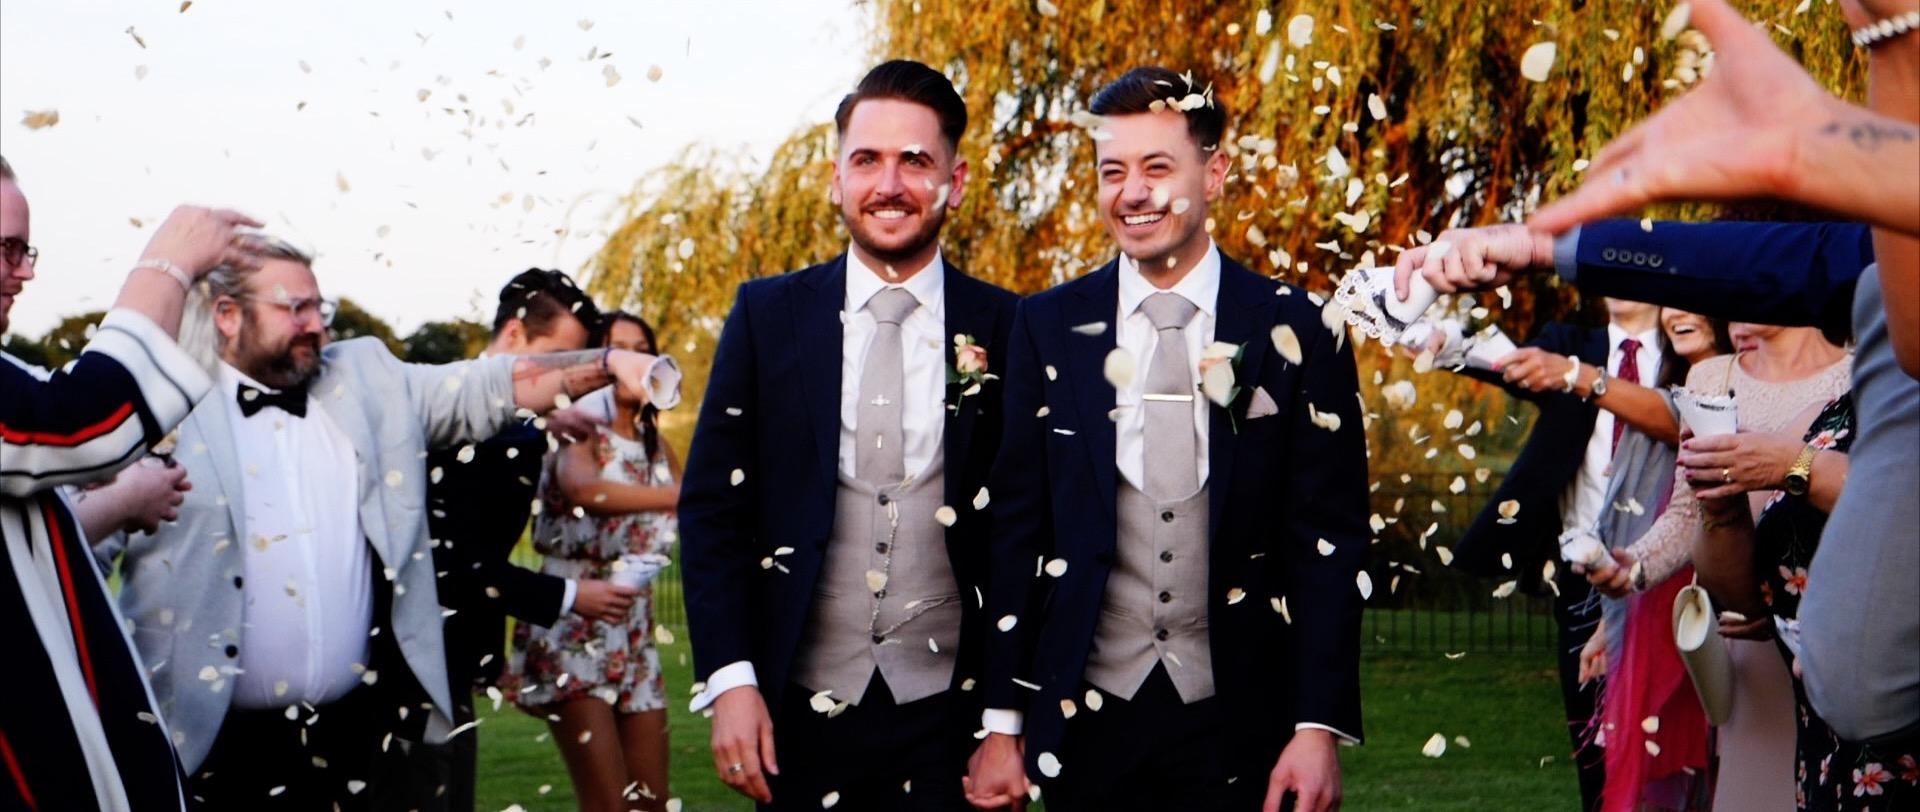 The Rayleigh Club Wedding Videography